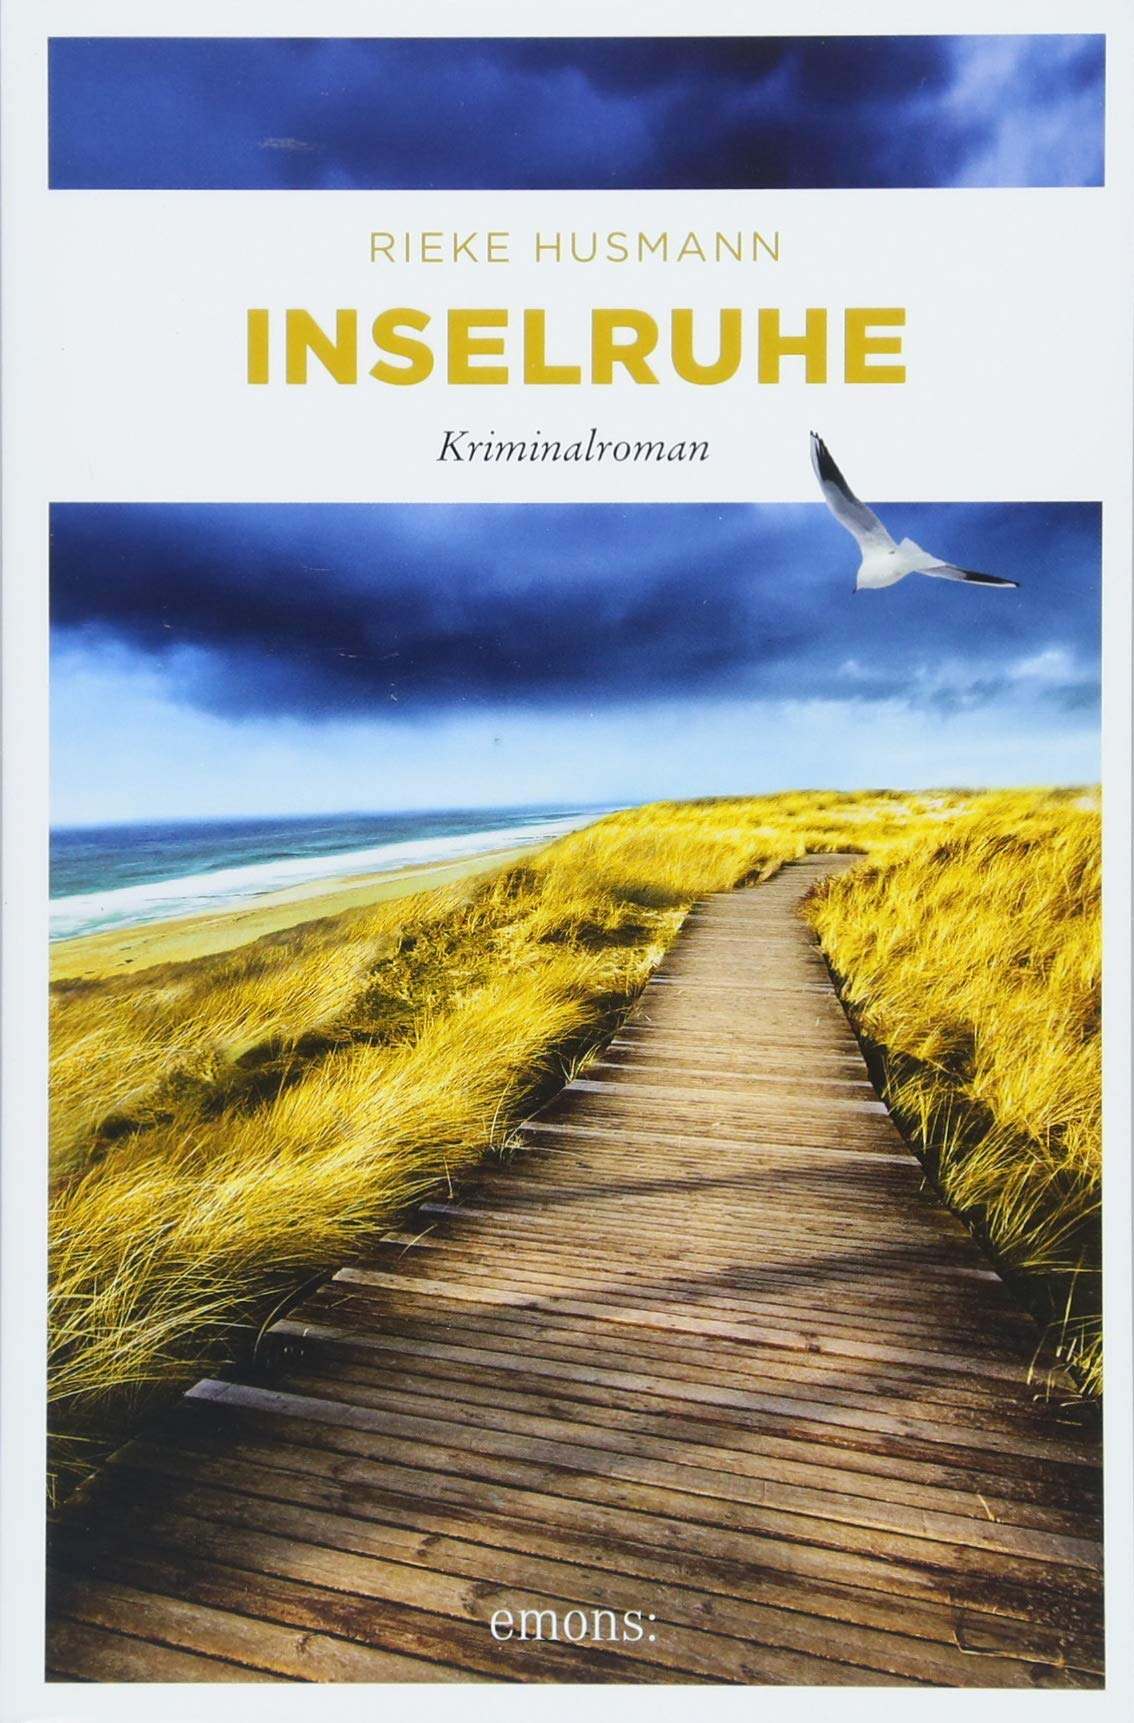 Inselruhe: Kriminalroman Taschenbuch – 15. März 2018 Rieke Husmann Emons Verlag 3740803657 Belletristik / Kriminalromane